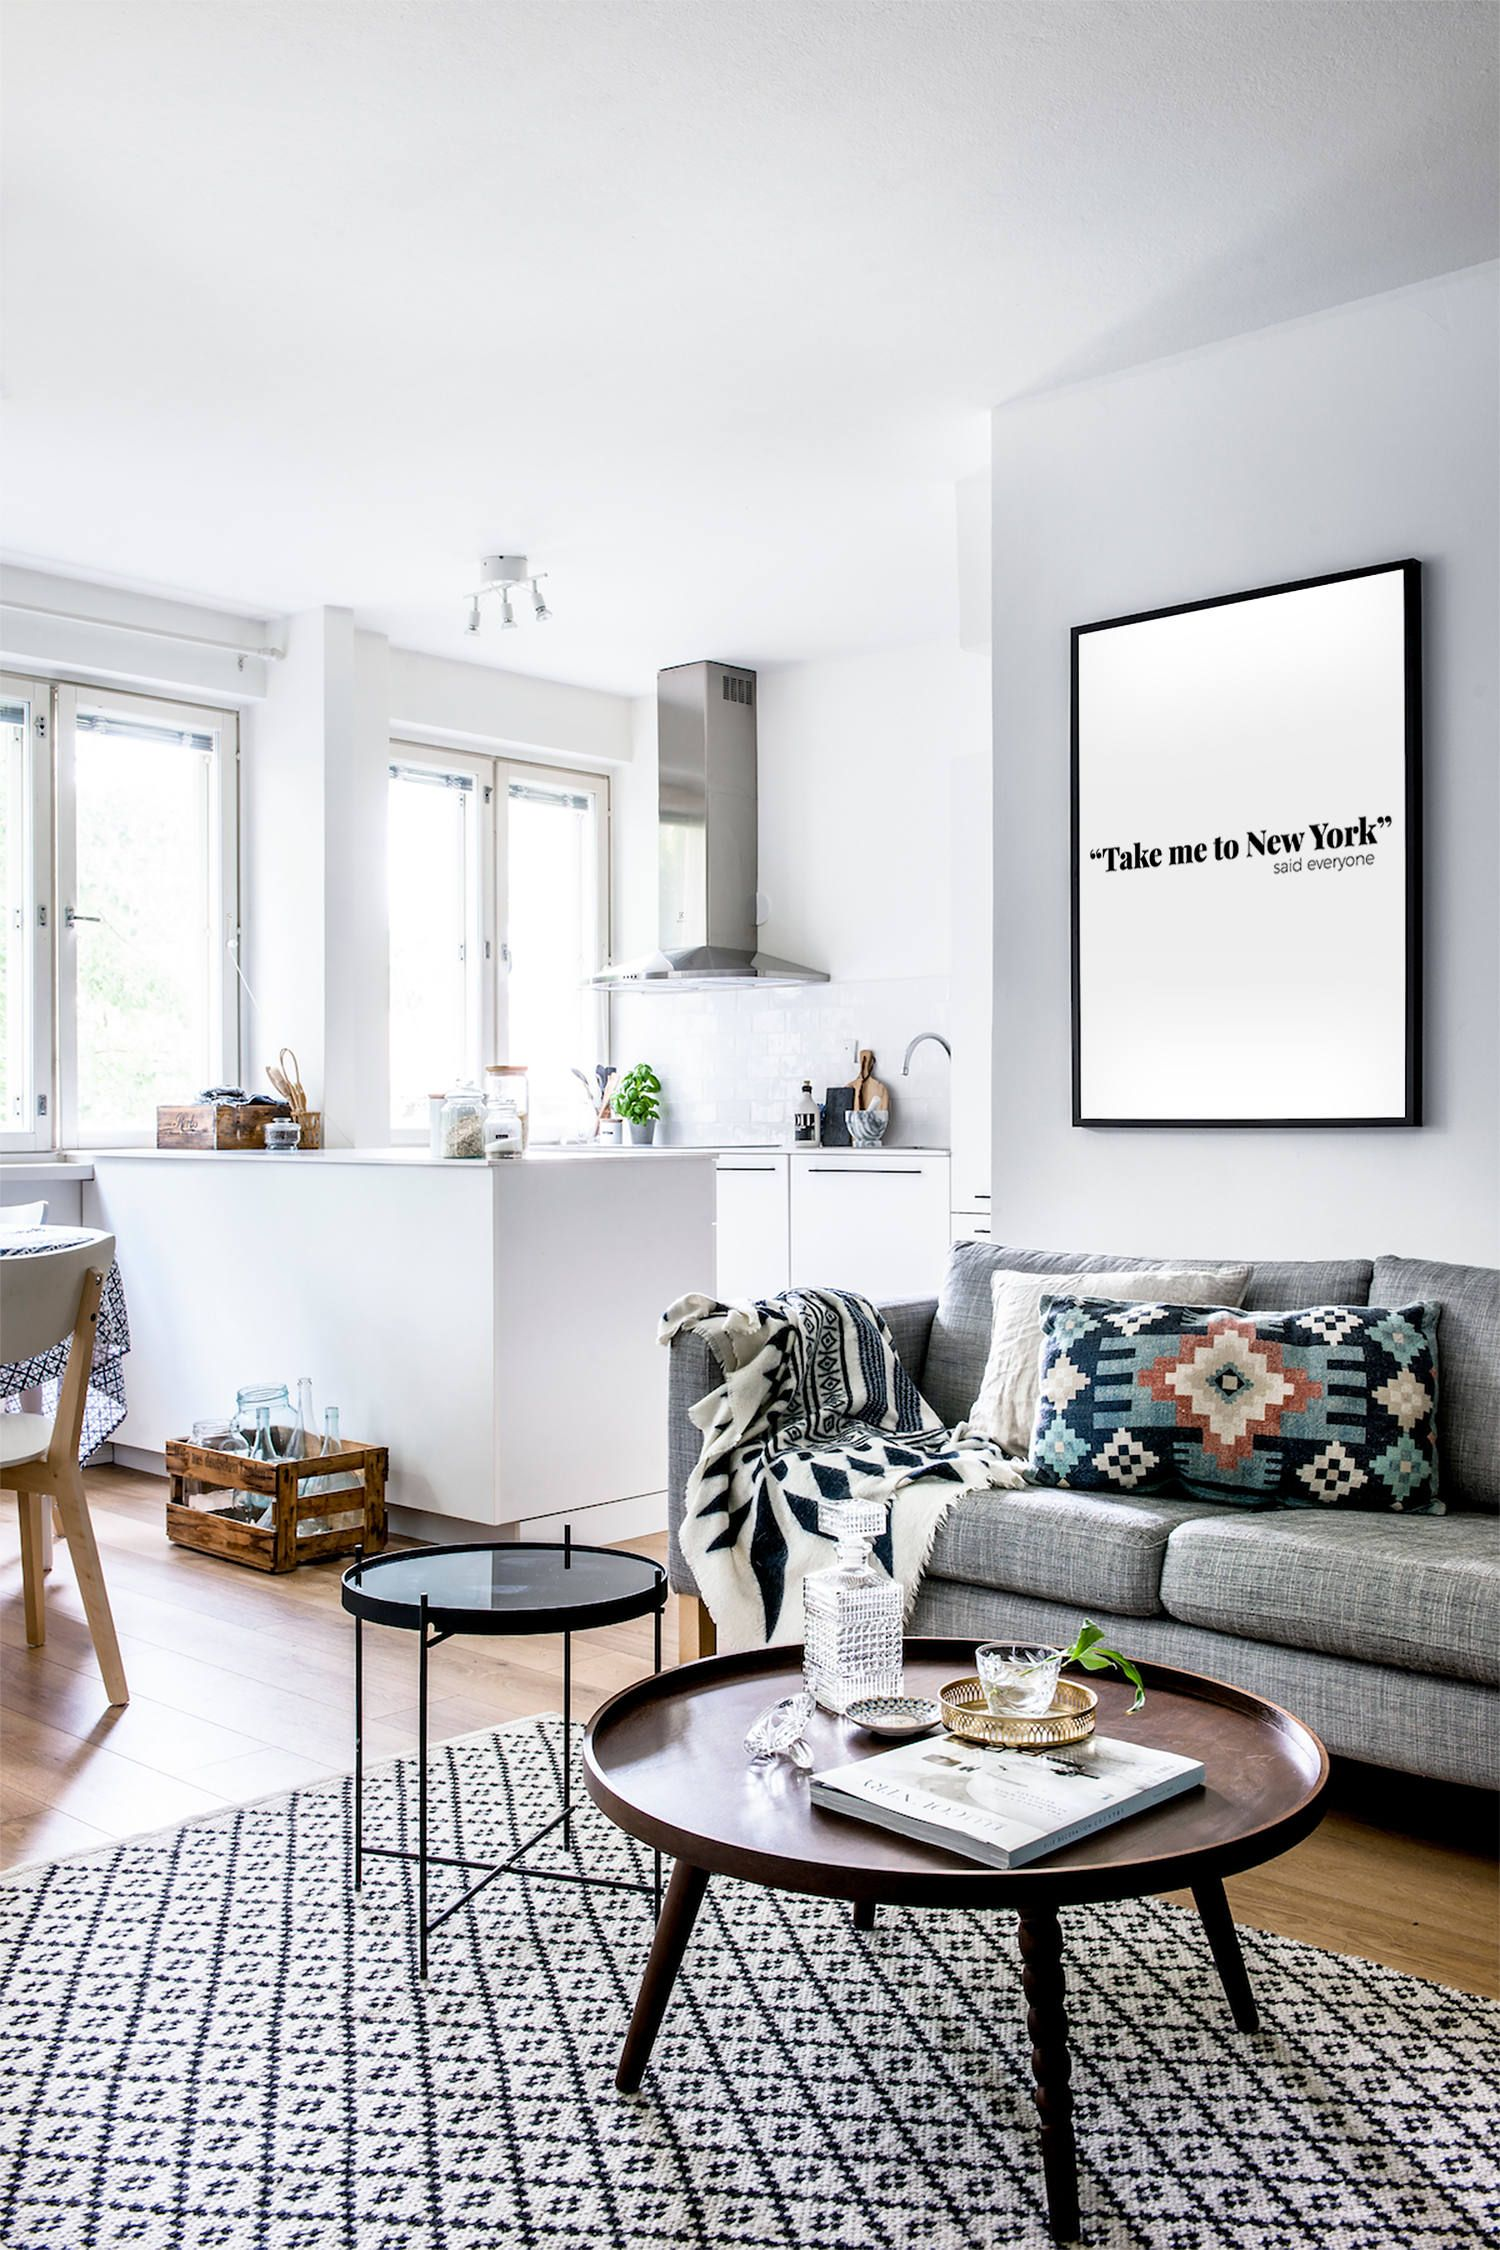 New York Funny Art Print Humorous Sarcastic Funny Wall Art Etsy Living Room Scandinavian Living Decor Living Room Decor